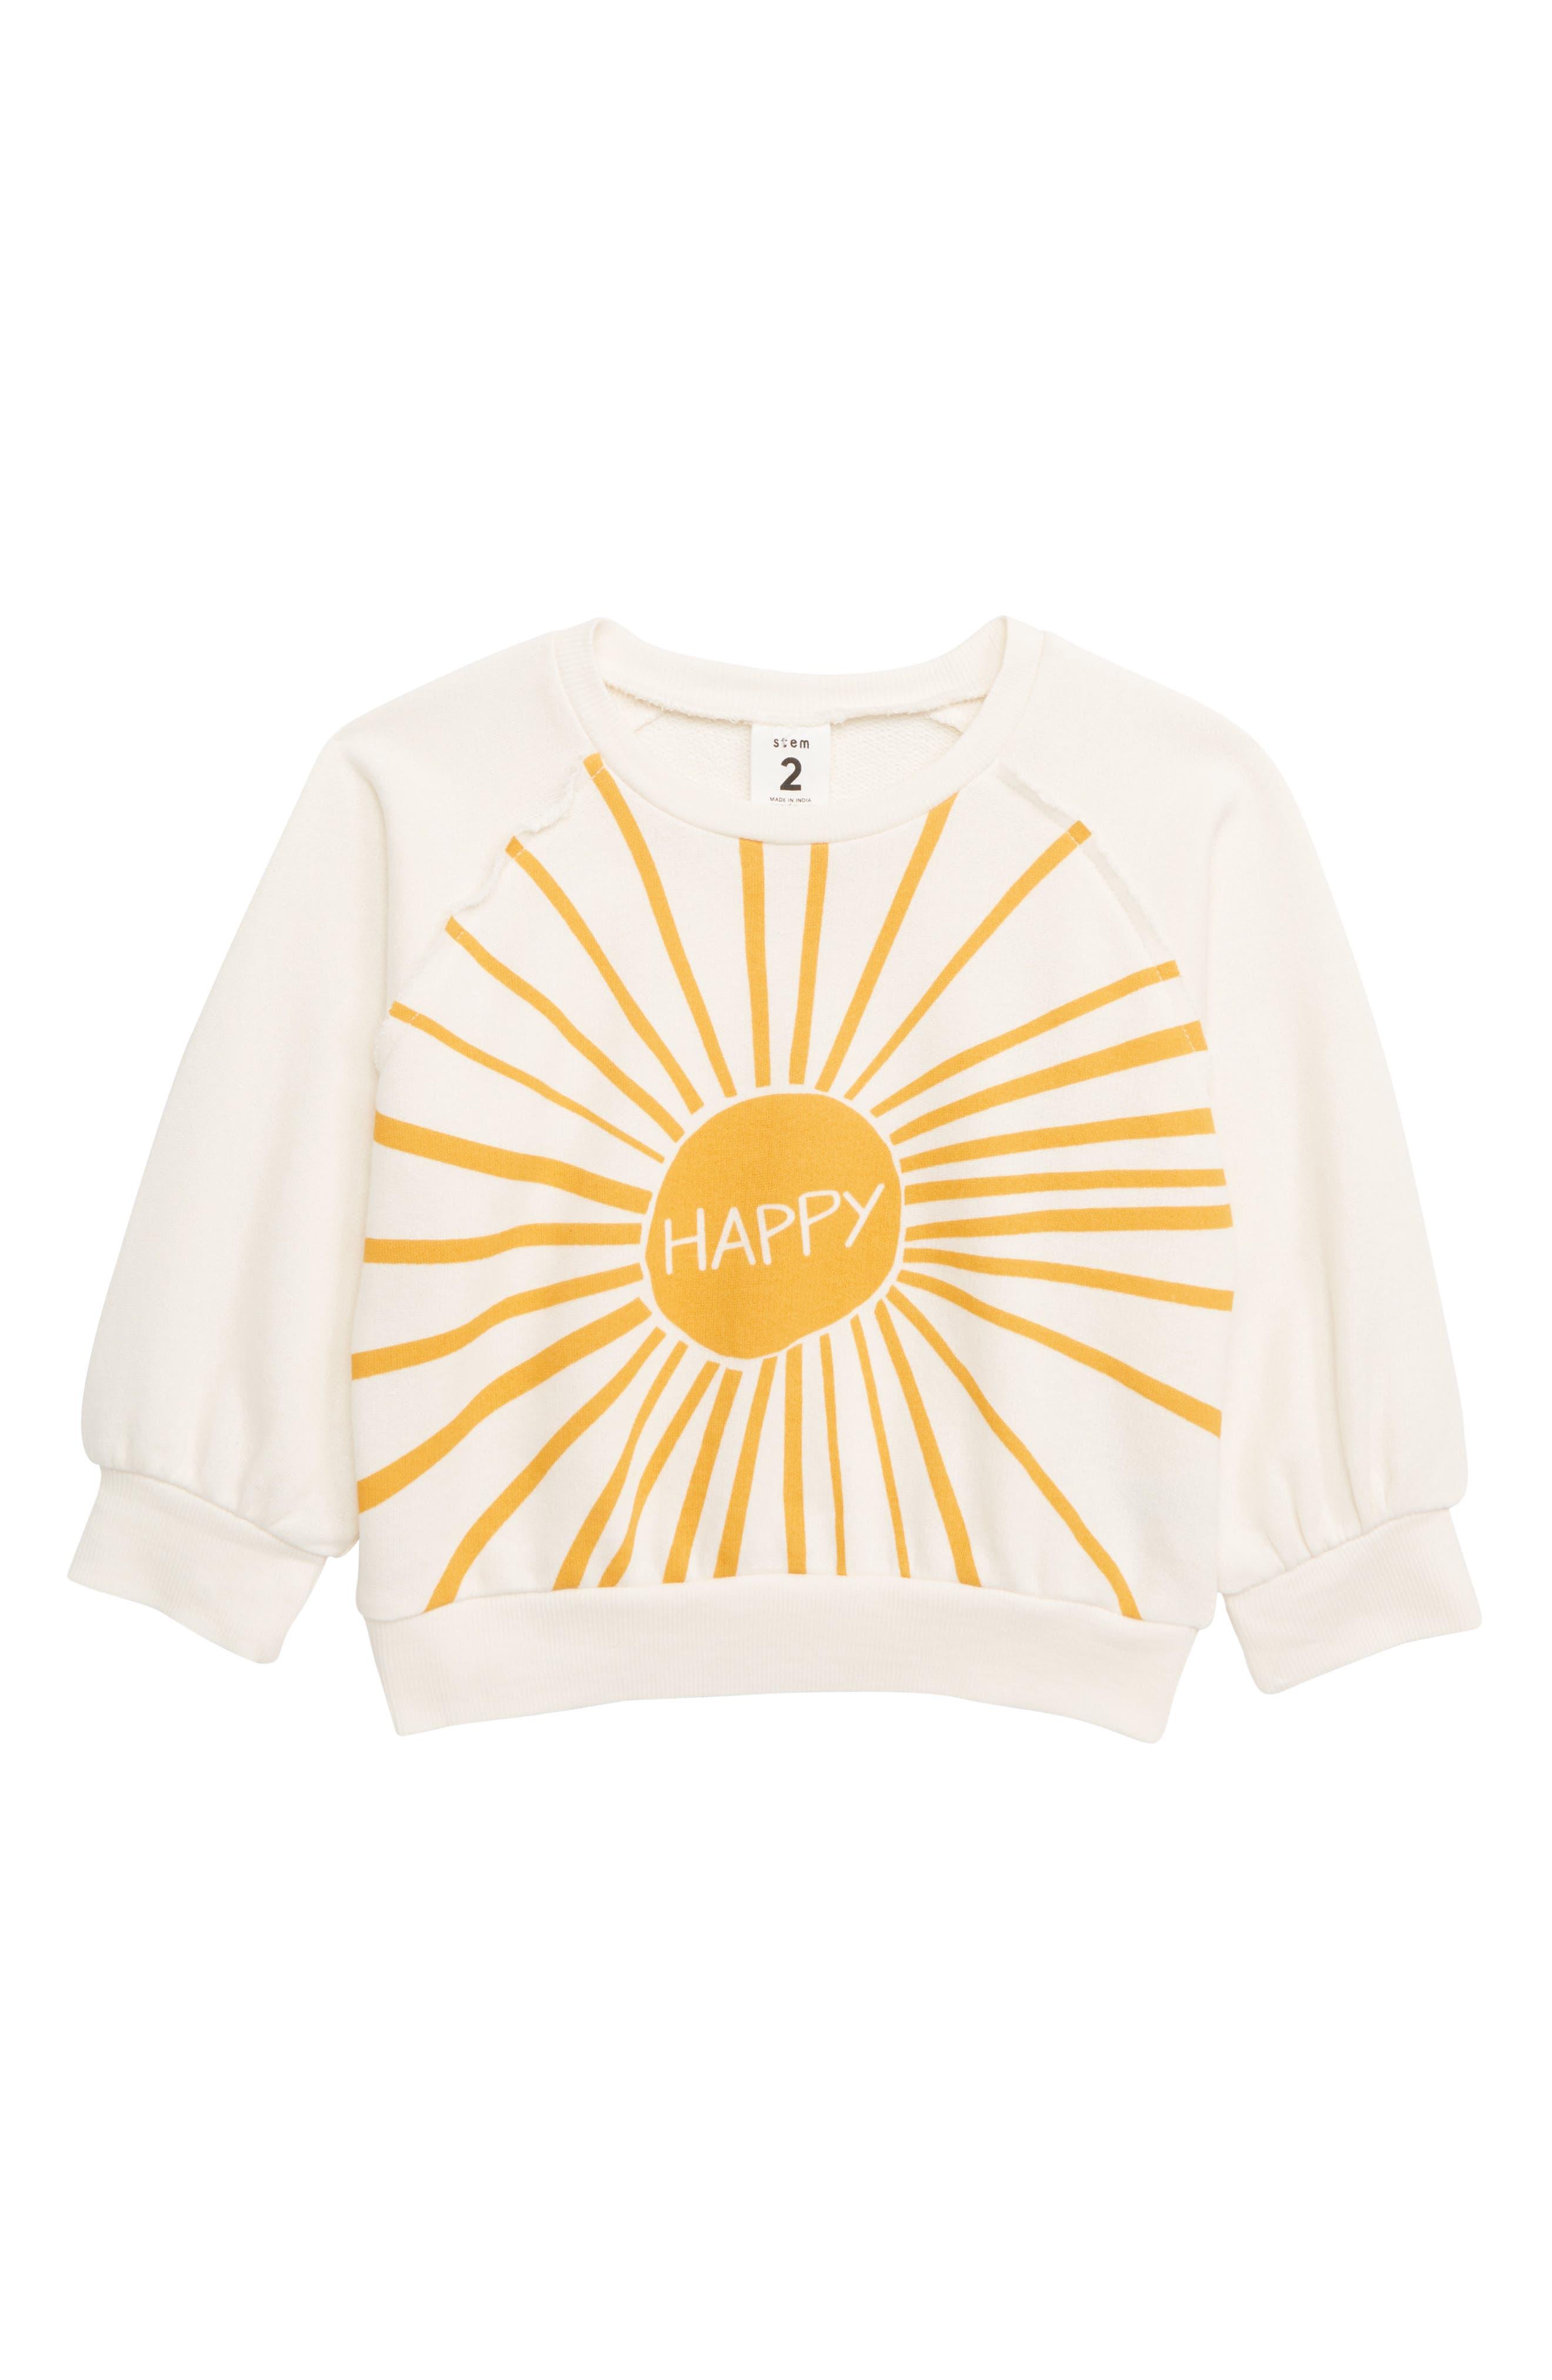 Toddler Girls Stem Swoop Graphic Sweatshirt Size 3T  Ivory